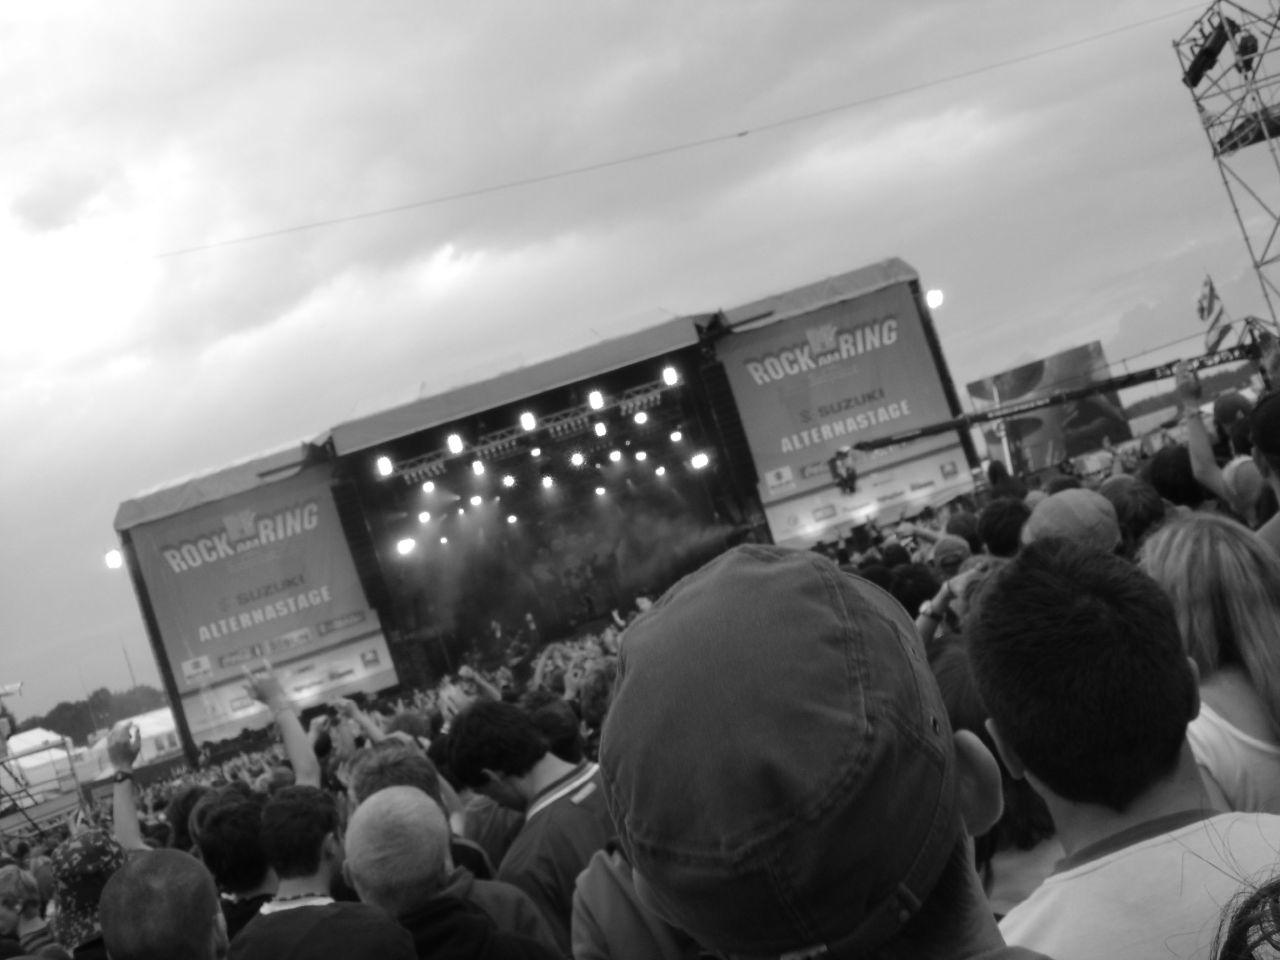 Rock am Ring 2007